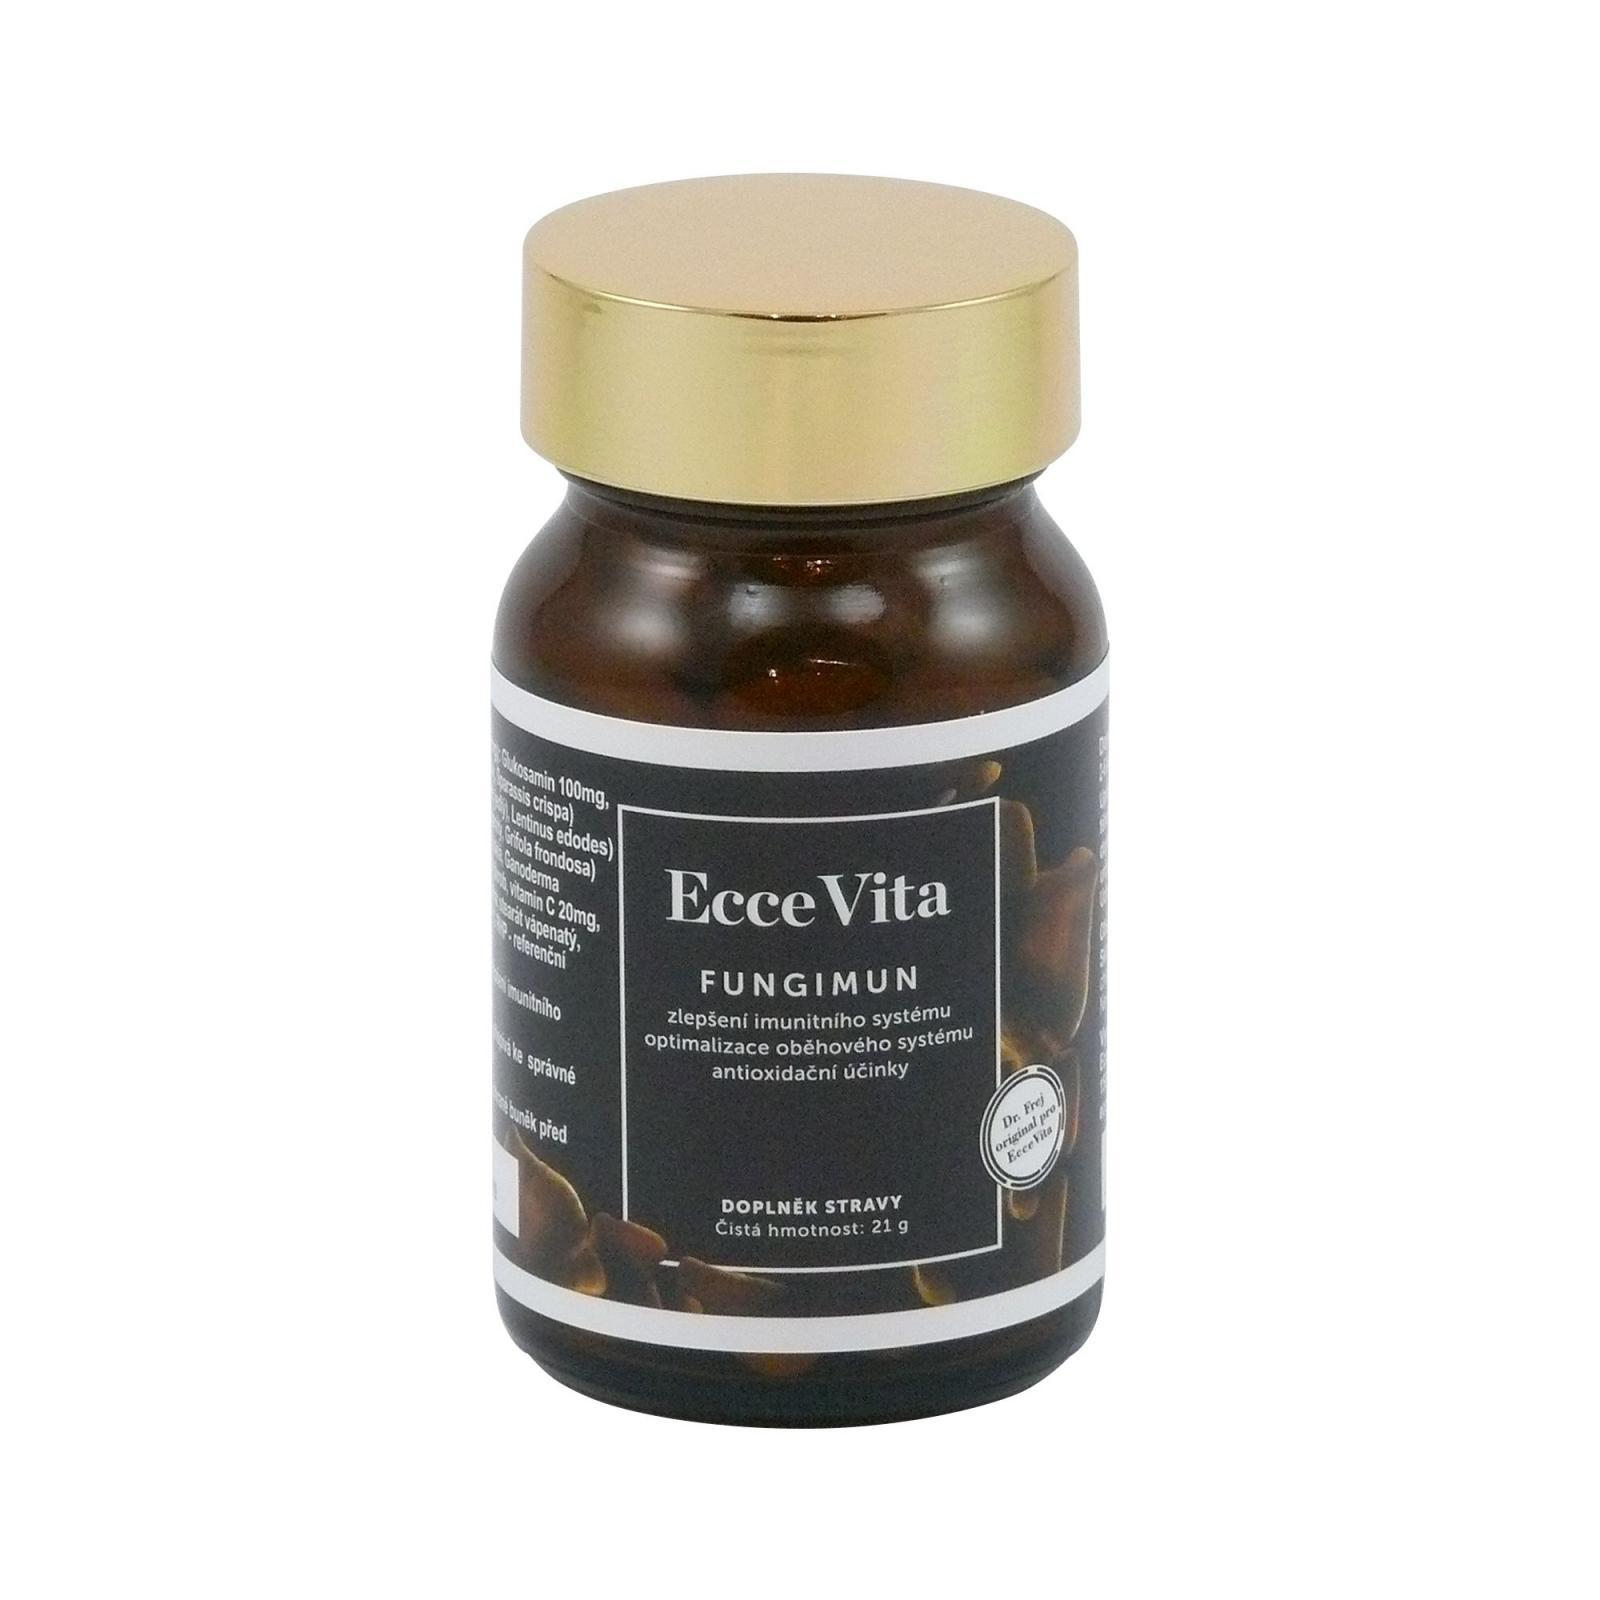 Ecce Vita Fungimun, kapsle 70 ks, 21 g